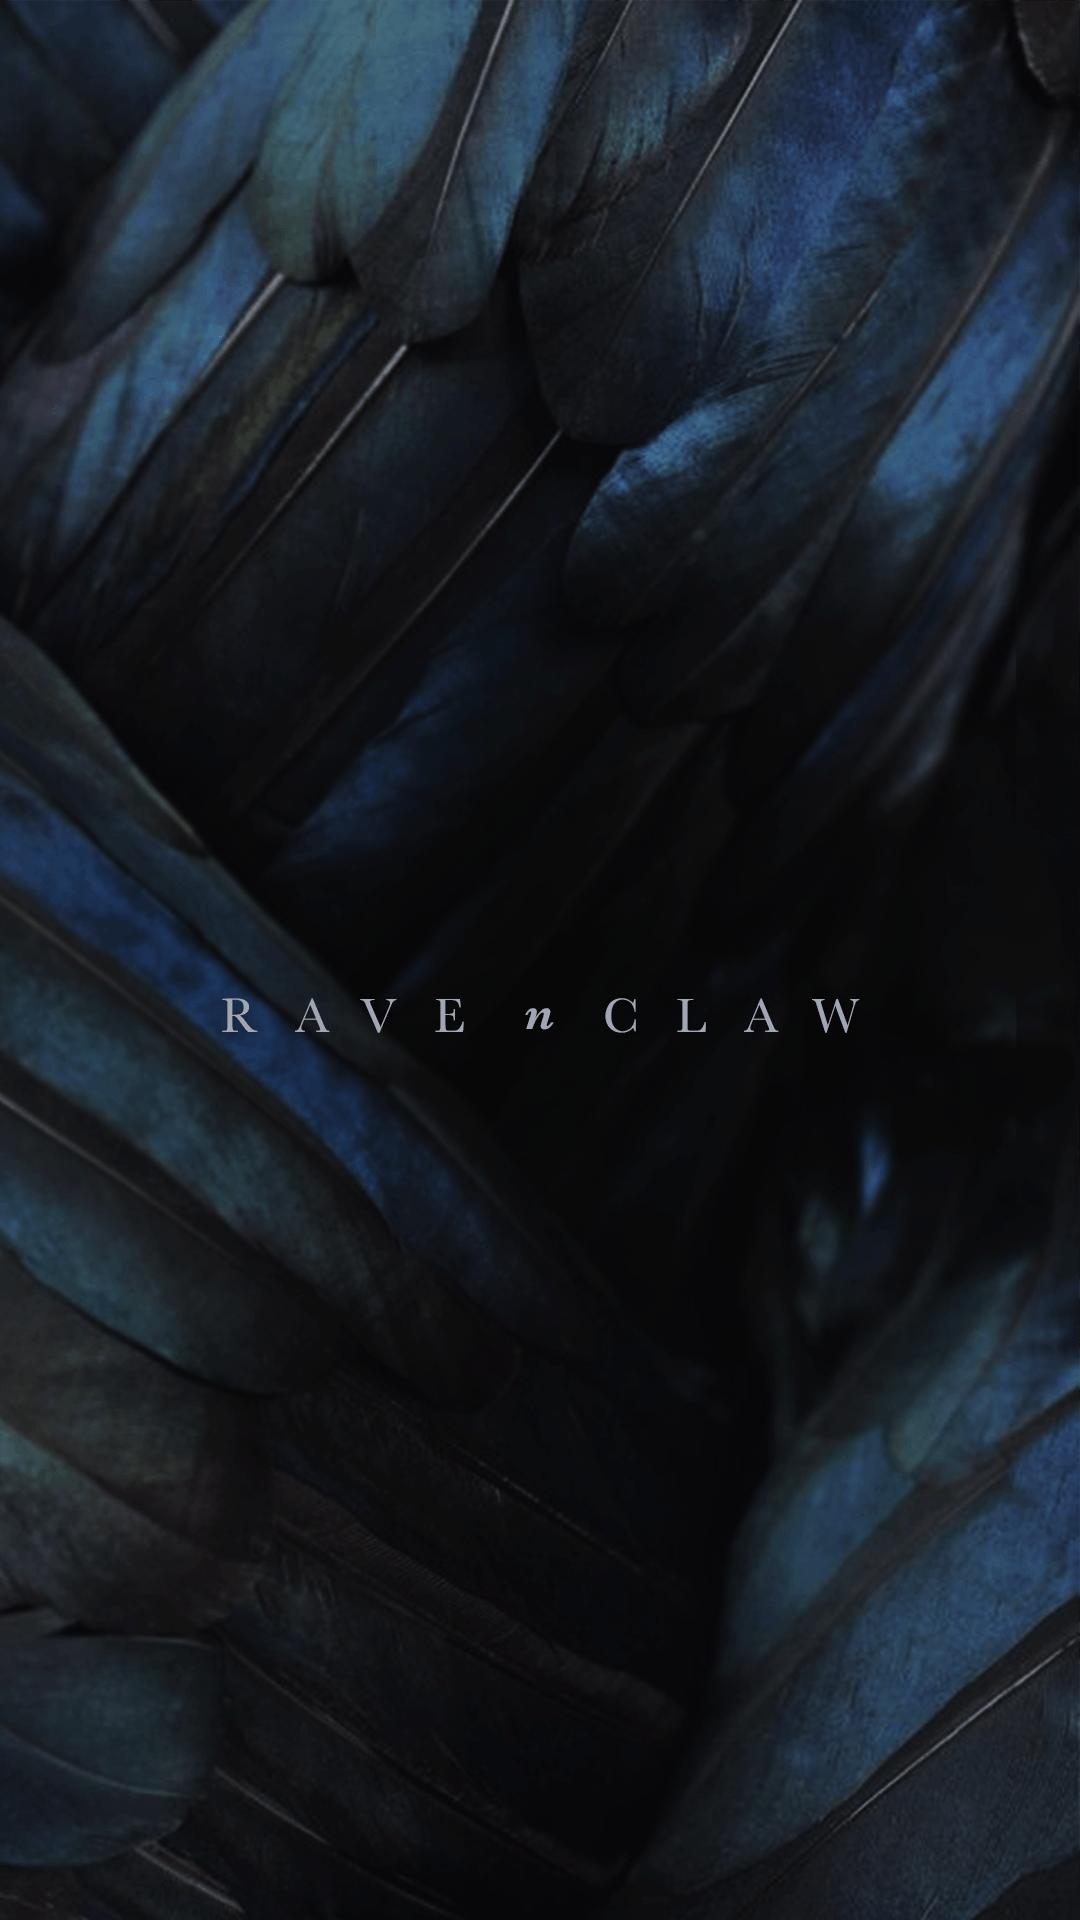 1080x1920 Ravenclaw Phone Wallpaper Paige Kleckner Ravenclaw Harry Potter Wallpaper Ravenclaw Aesthetic